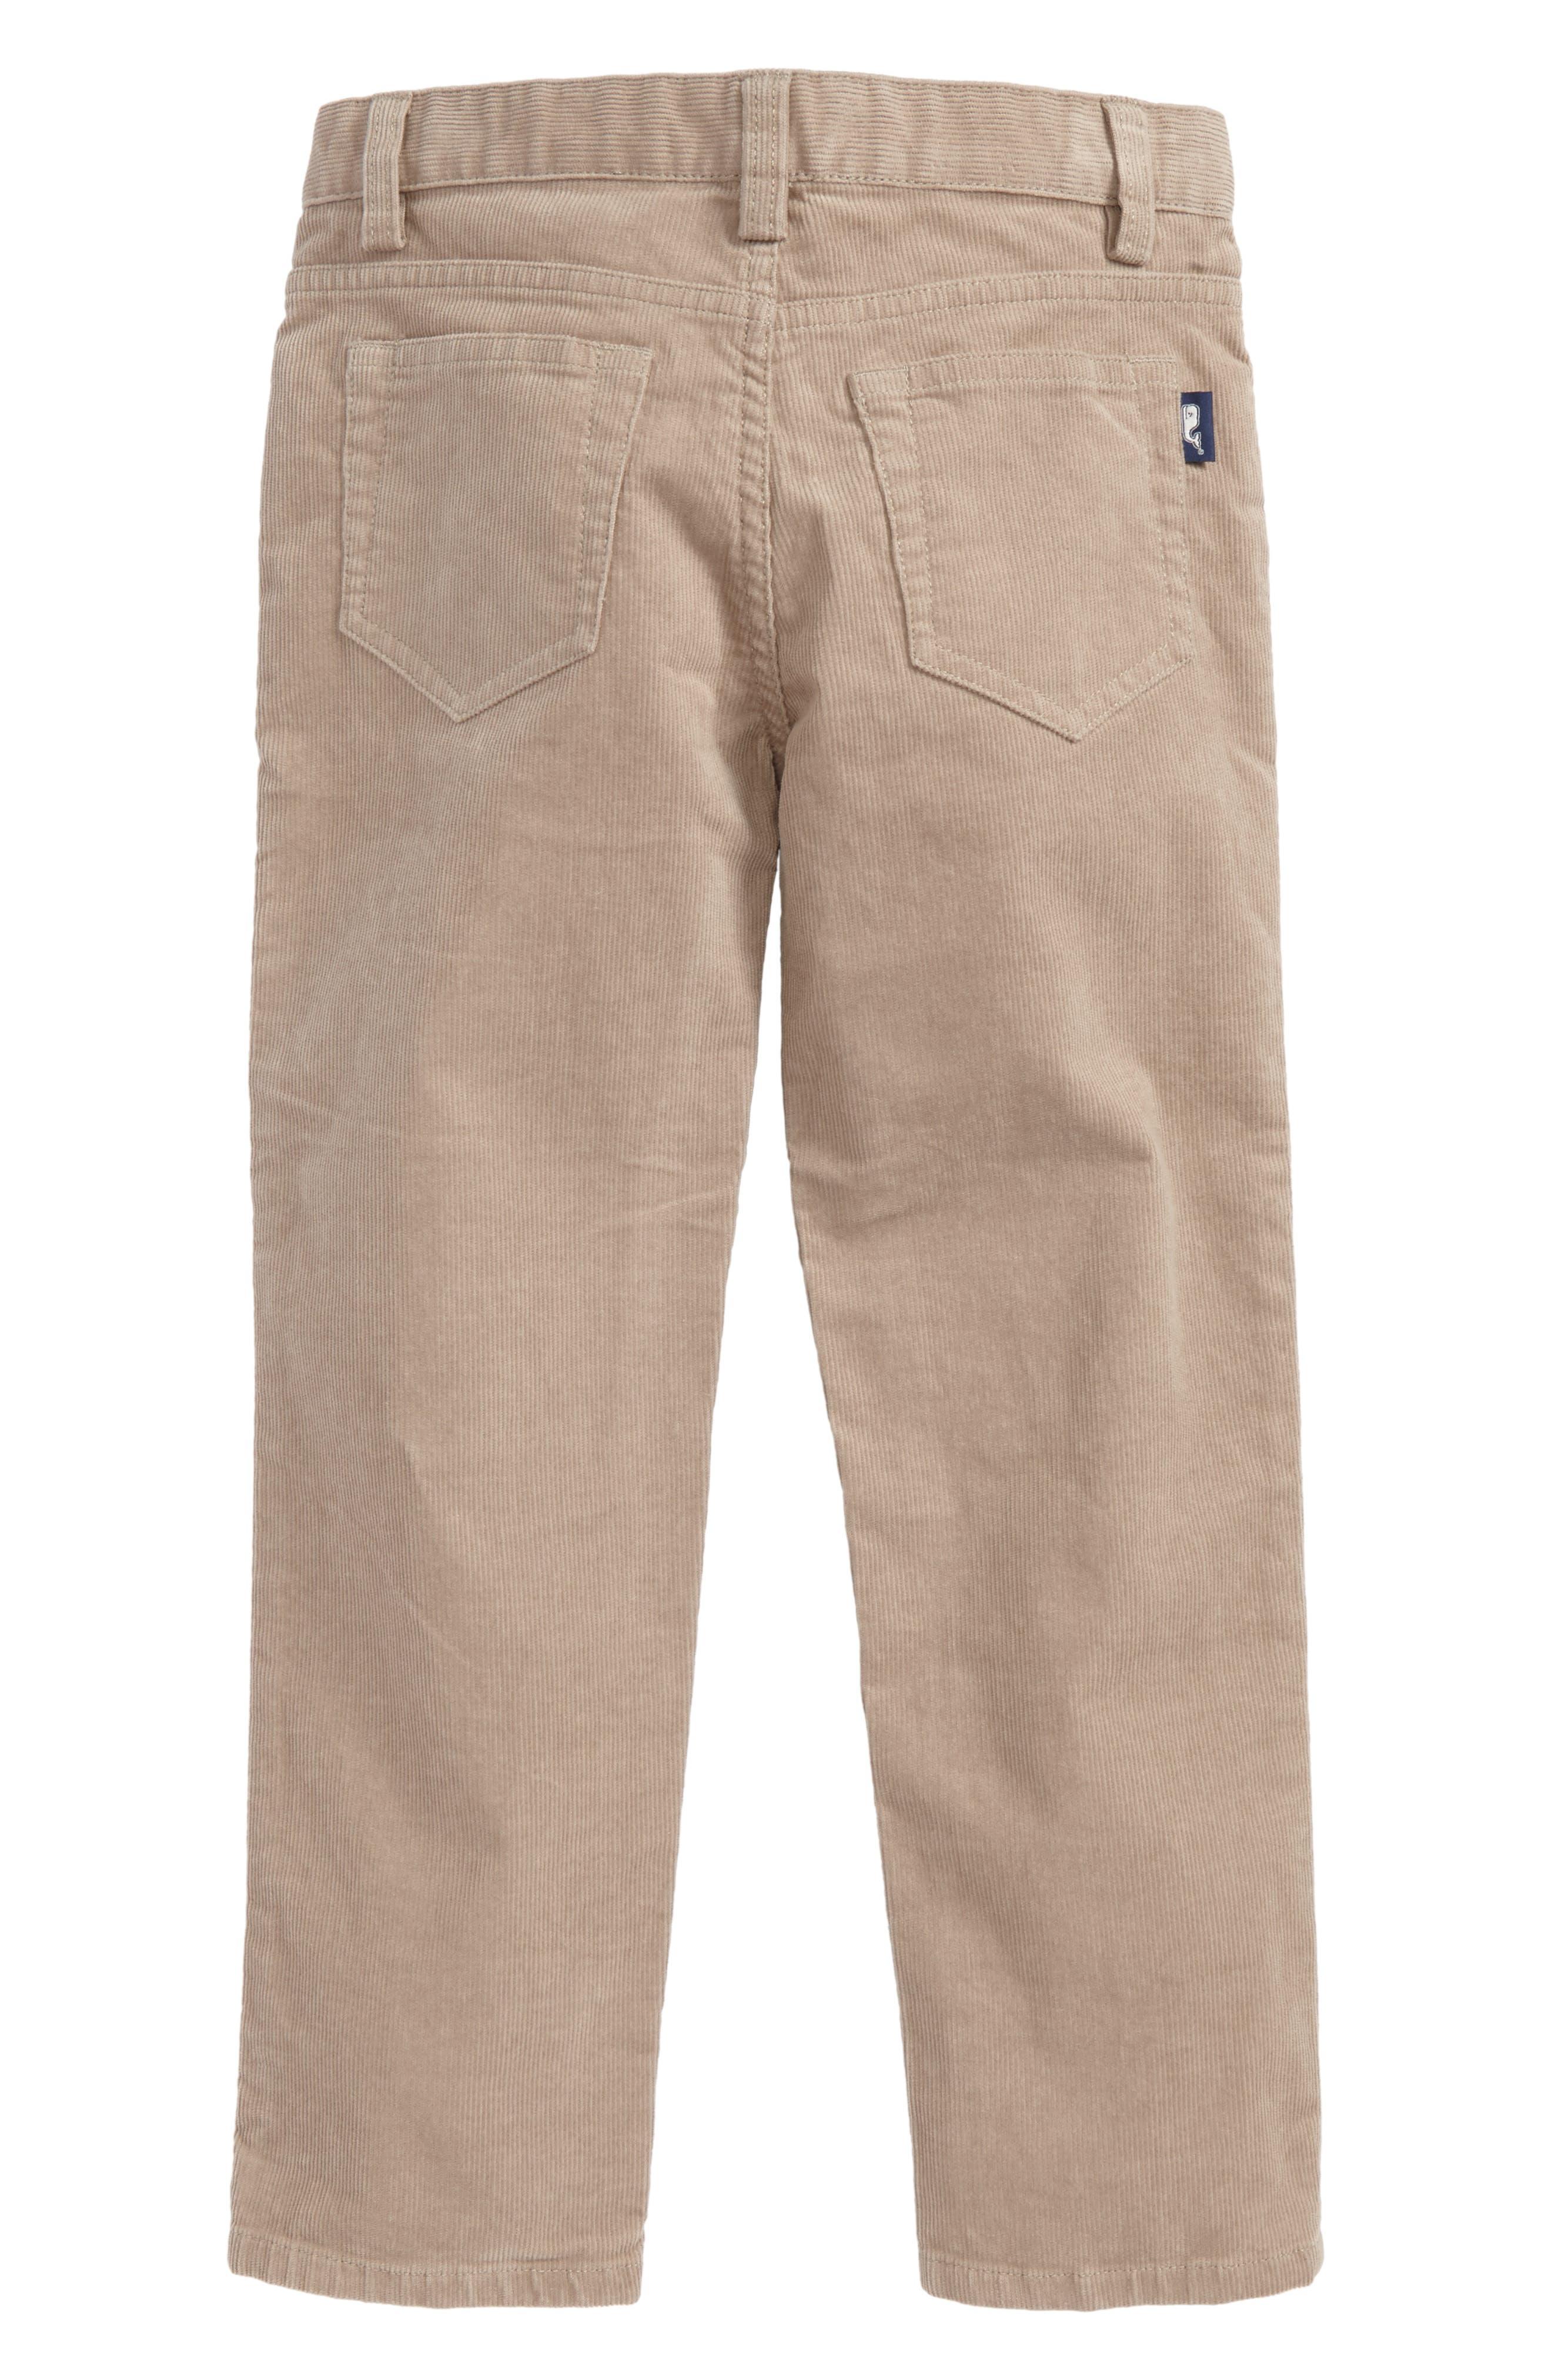 Corduroy Pants,                             Alternate thumbnail 2, color,                             Khaki